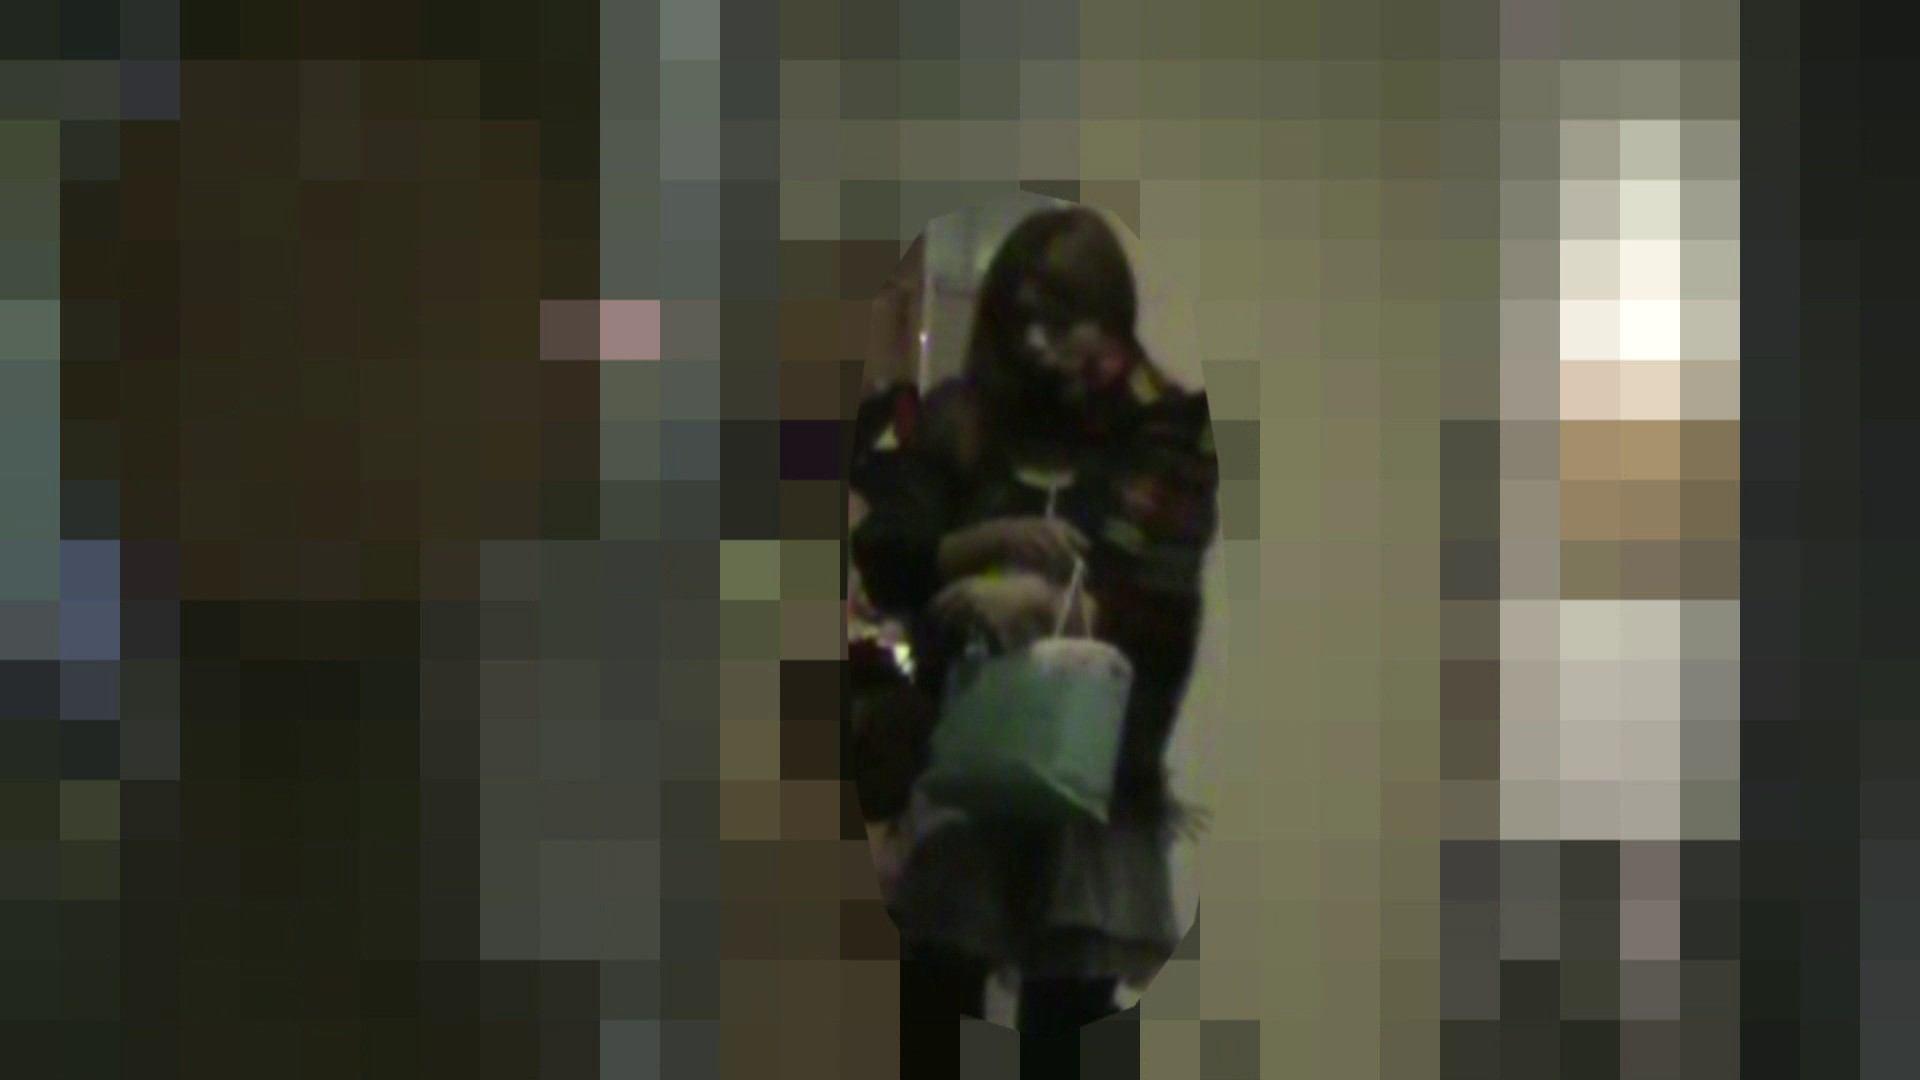 Aquaな露天風呂Vol.351 盗撮大放出 濡れ場動画紹介 48連発 3